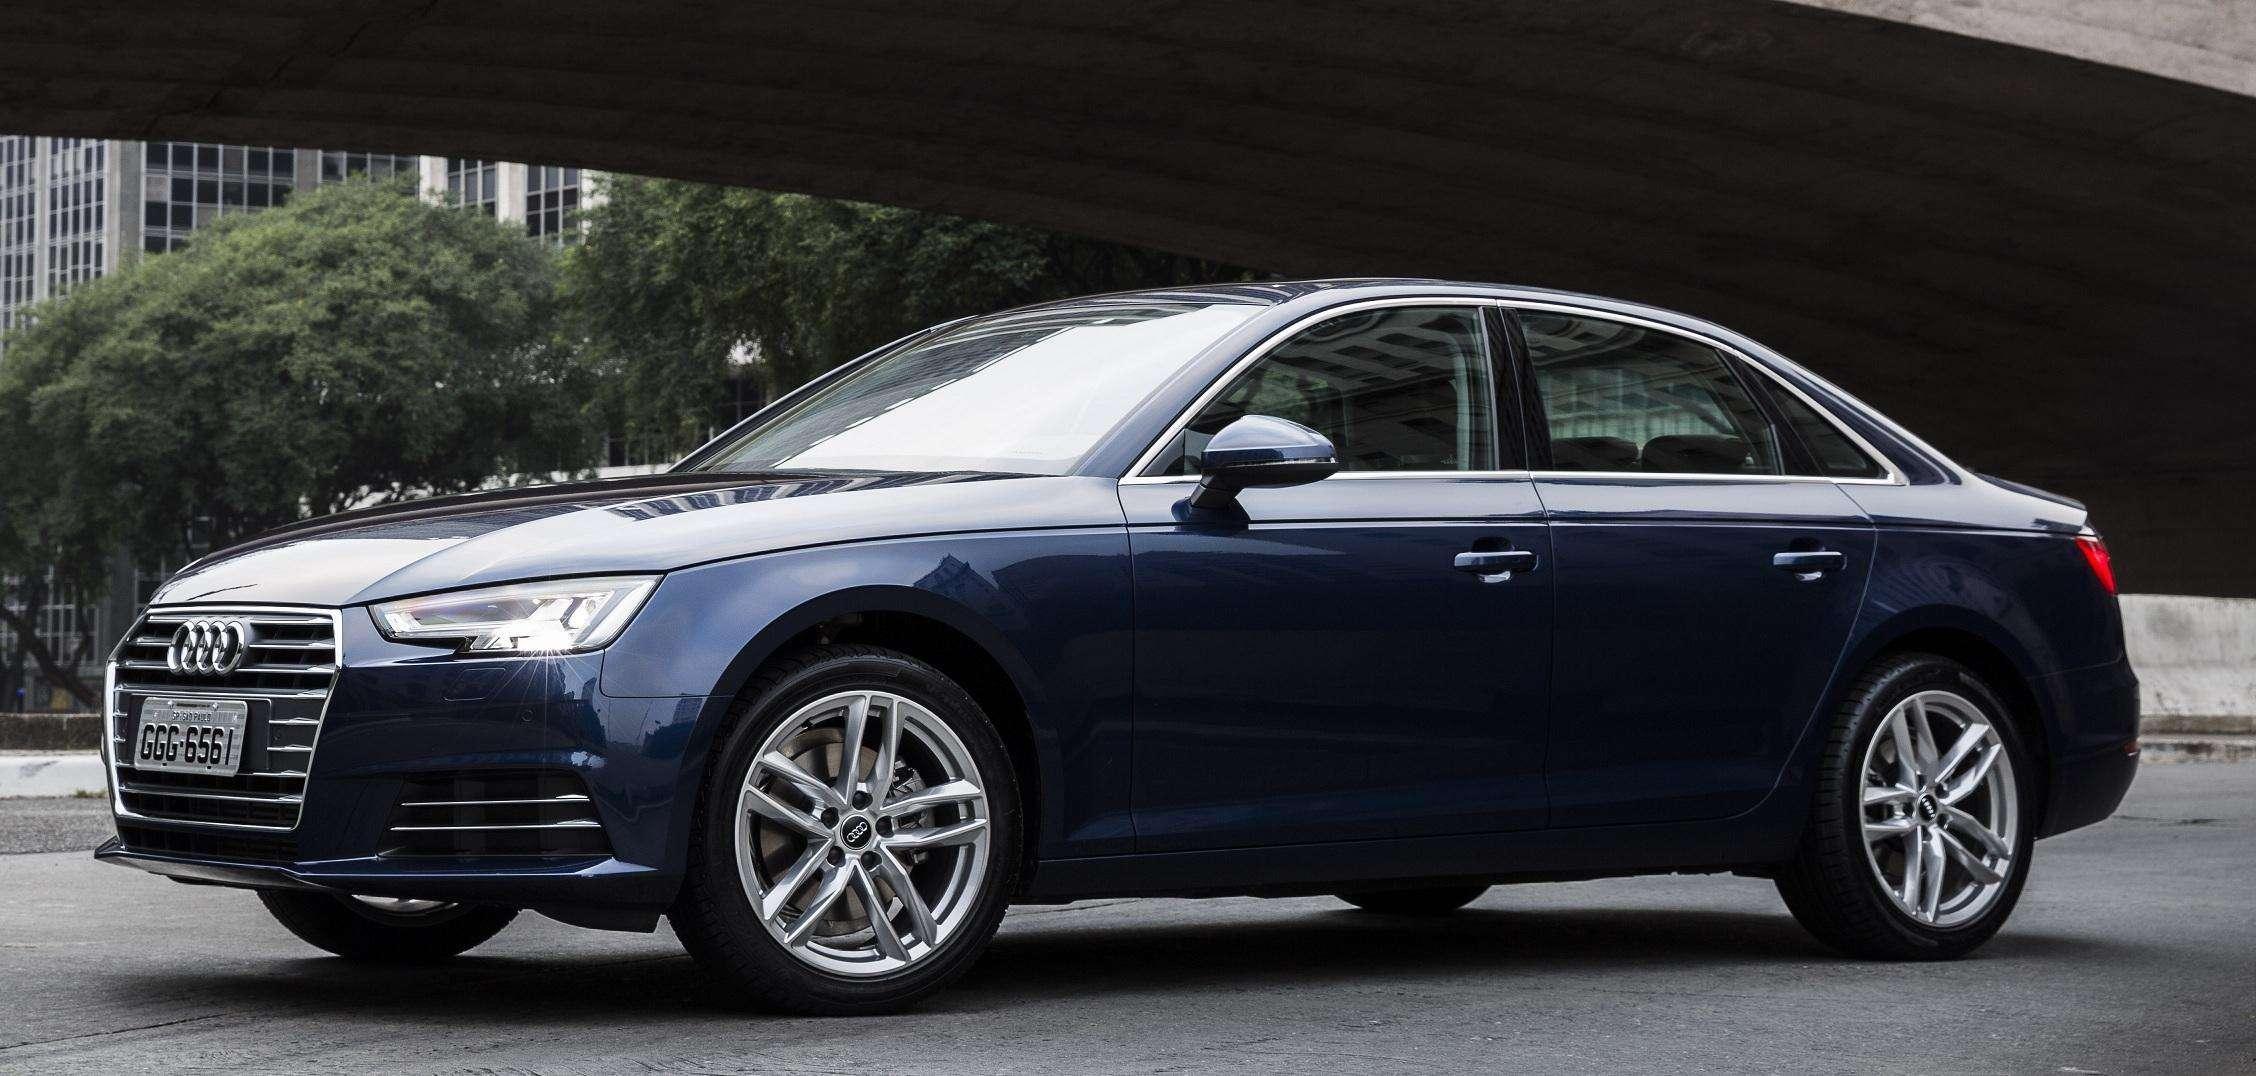 Audi-A4-4857